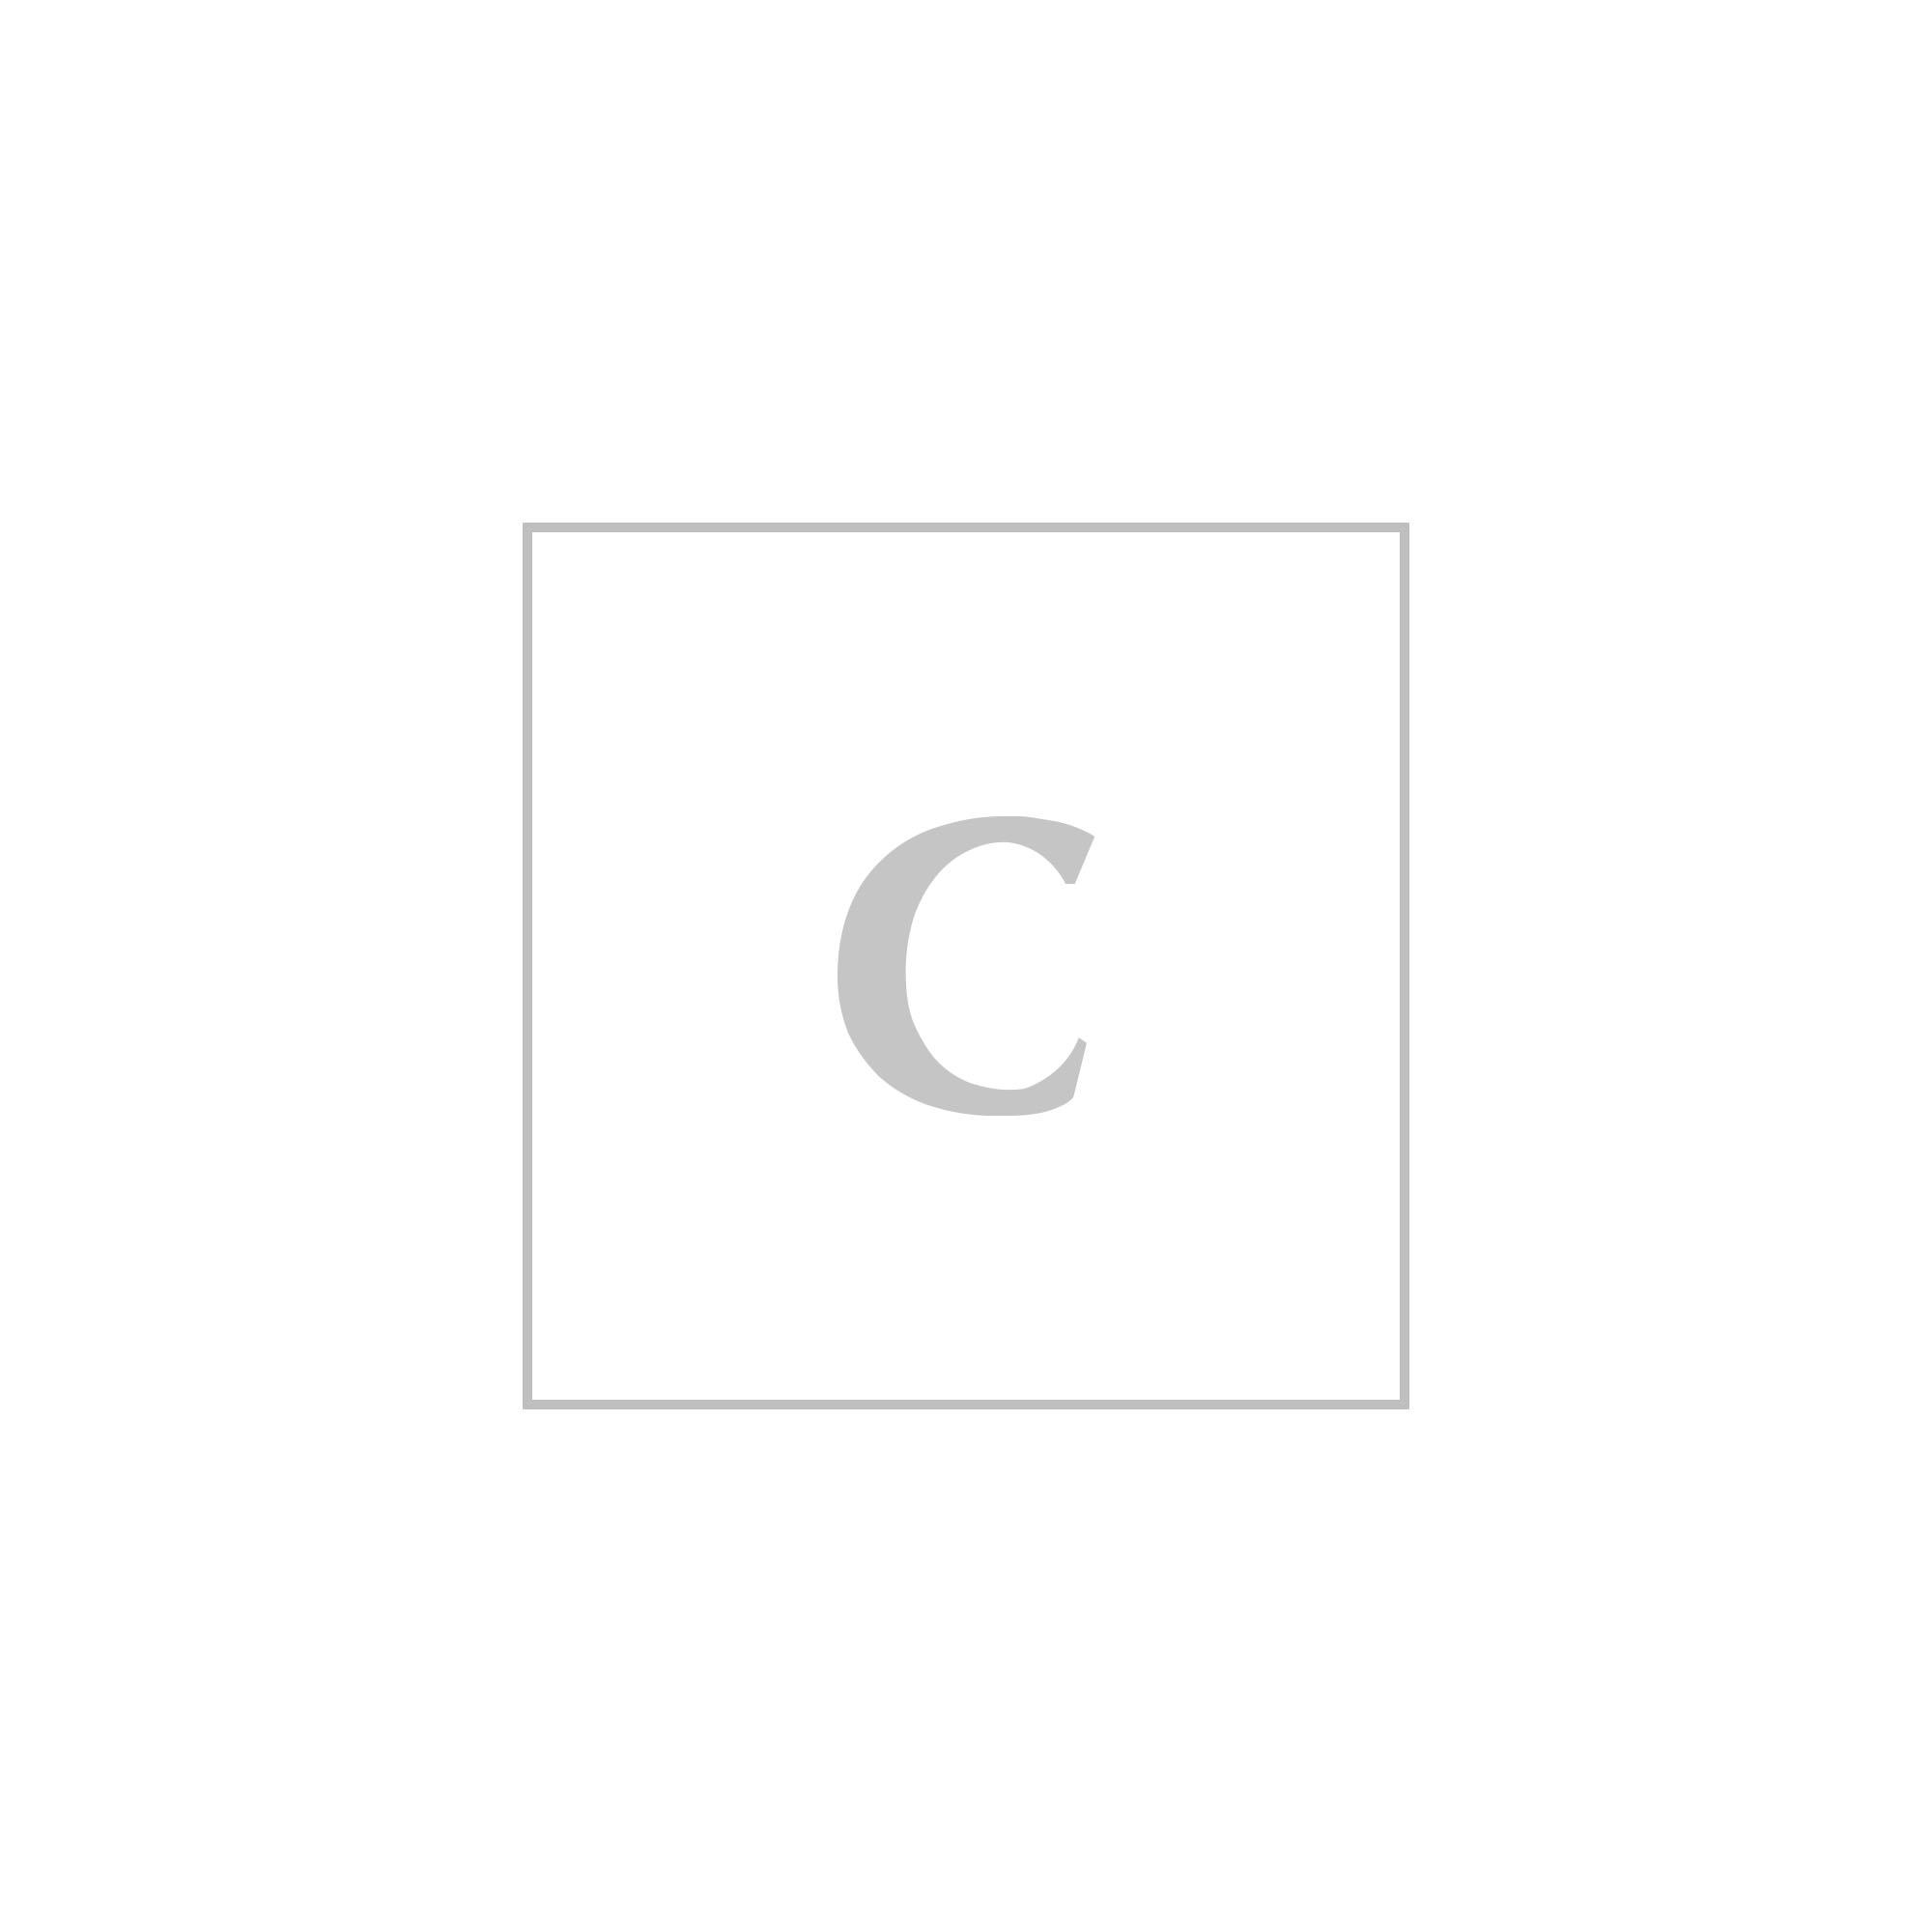 Burberry peyton clutch